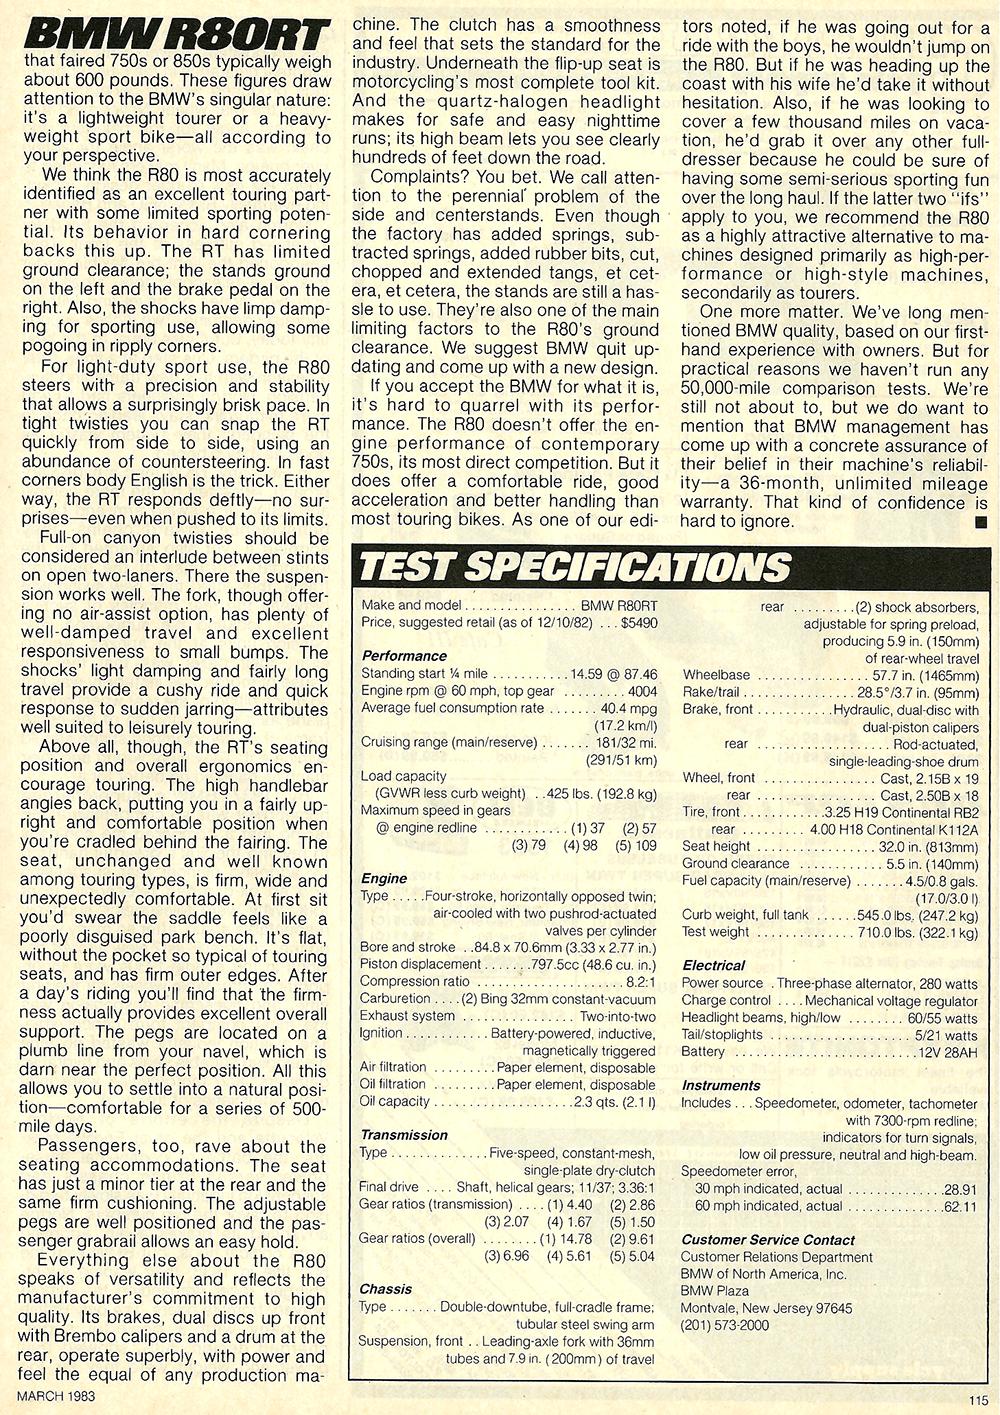 1983 BMW R80RT road test 7.jpg